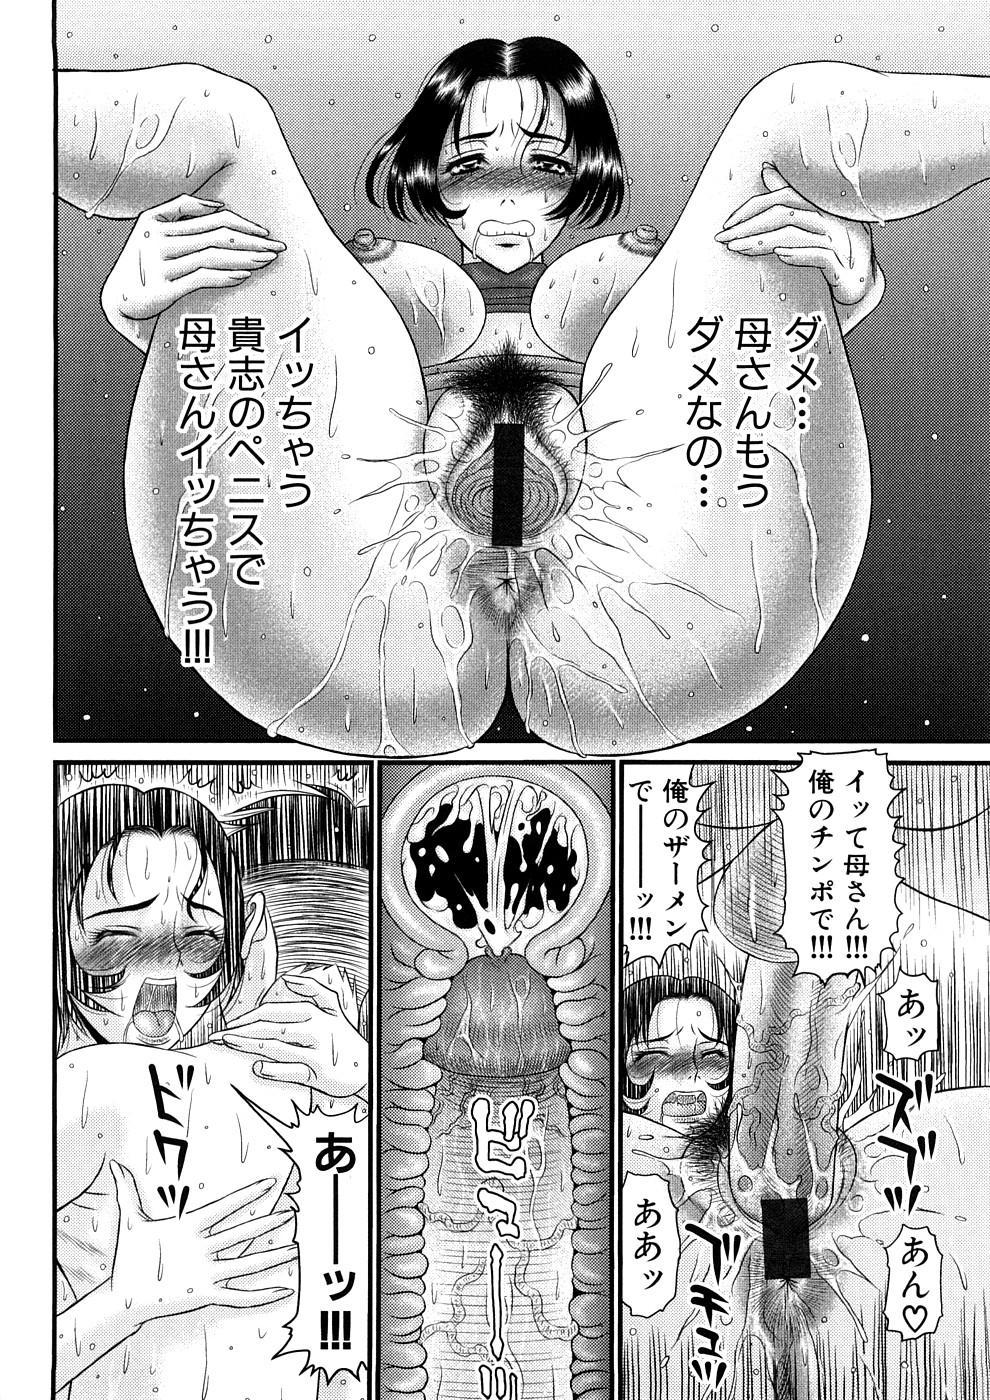 Geki Yaba Anthology Vol. 1 - Naka ni Dashite yo 168